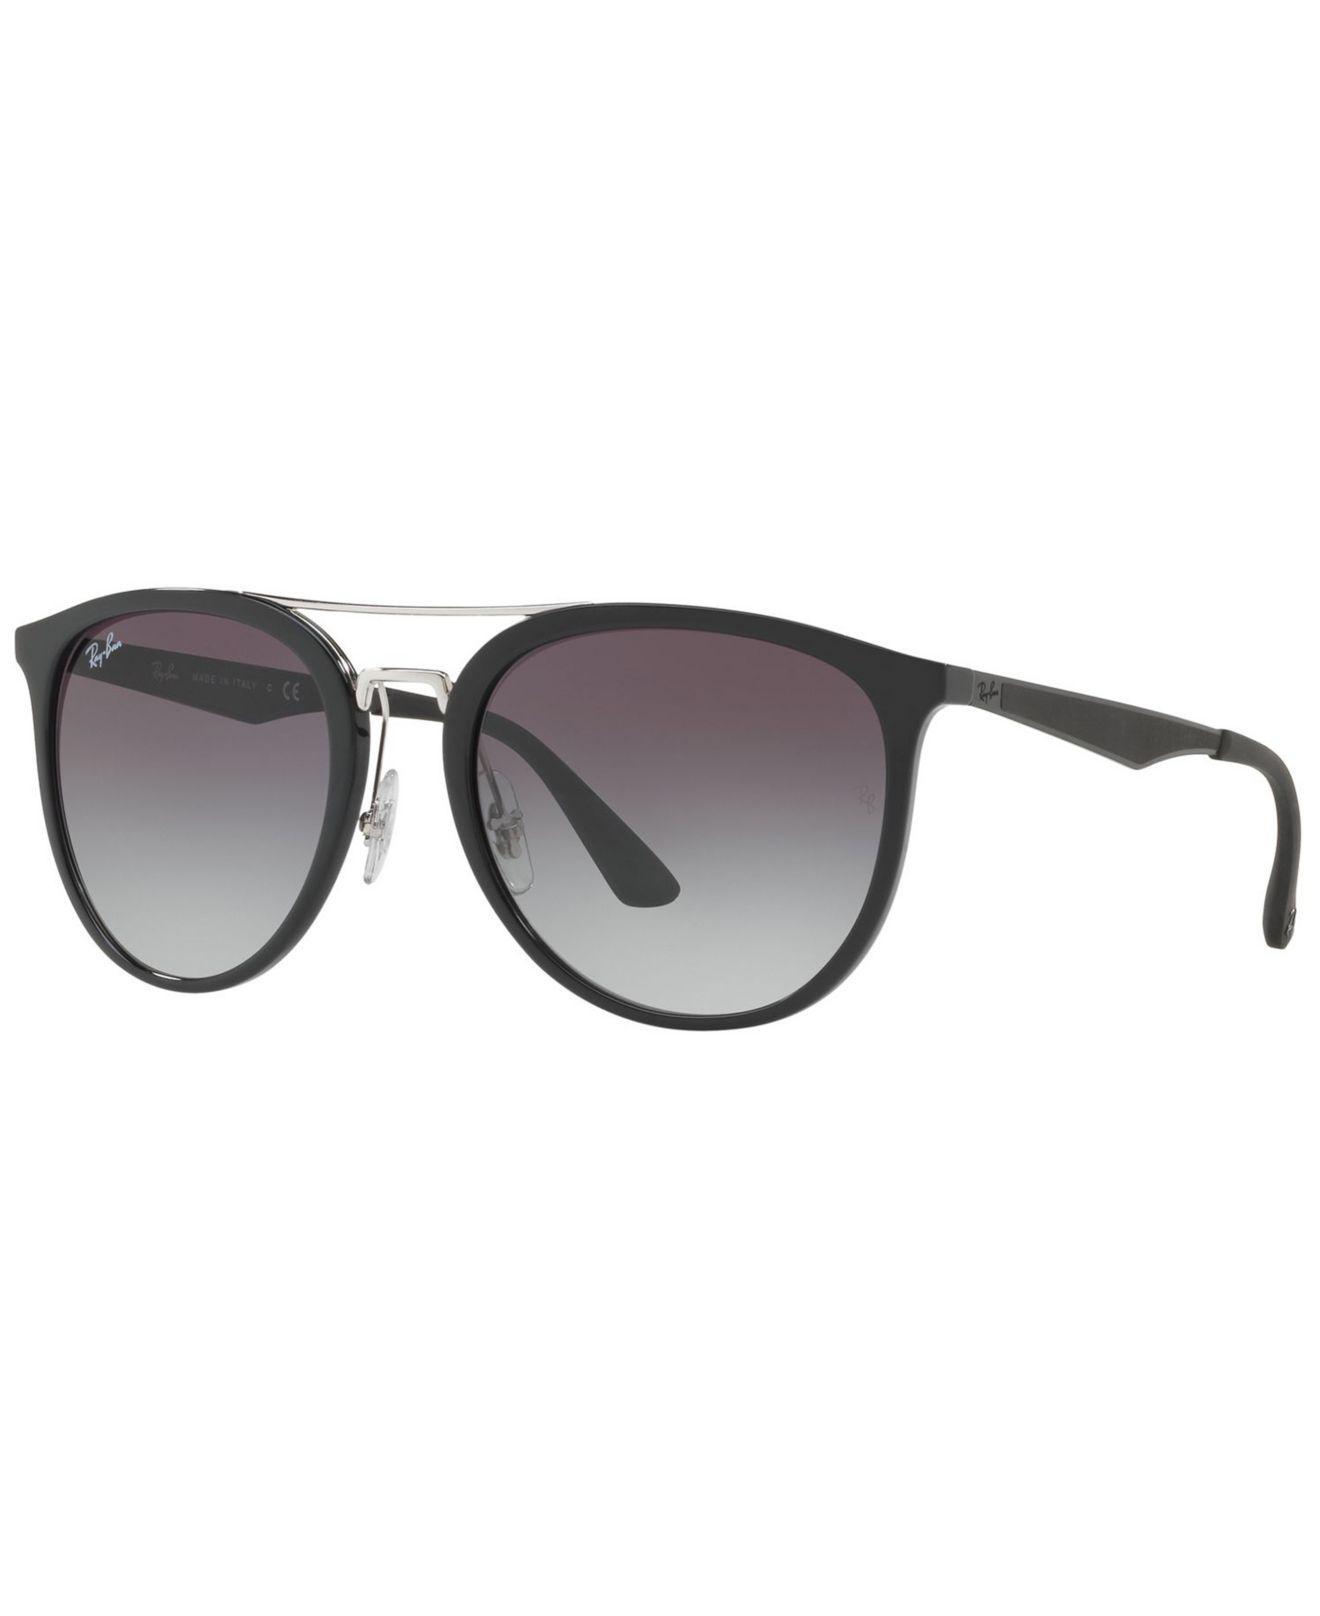 973c4428bc Ray-Ban. Men s Gray Sunglasses ...